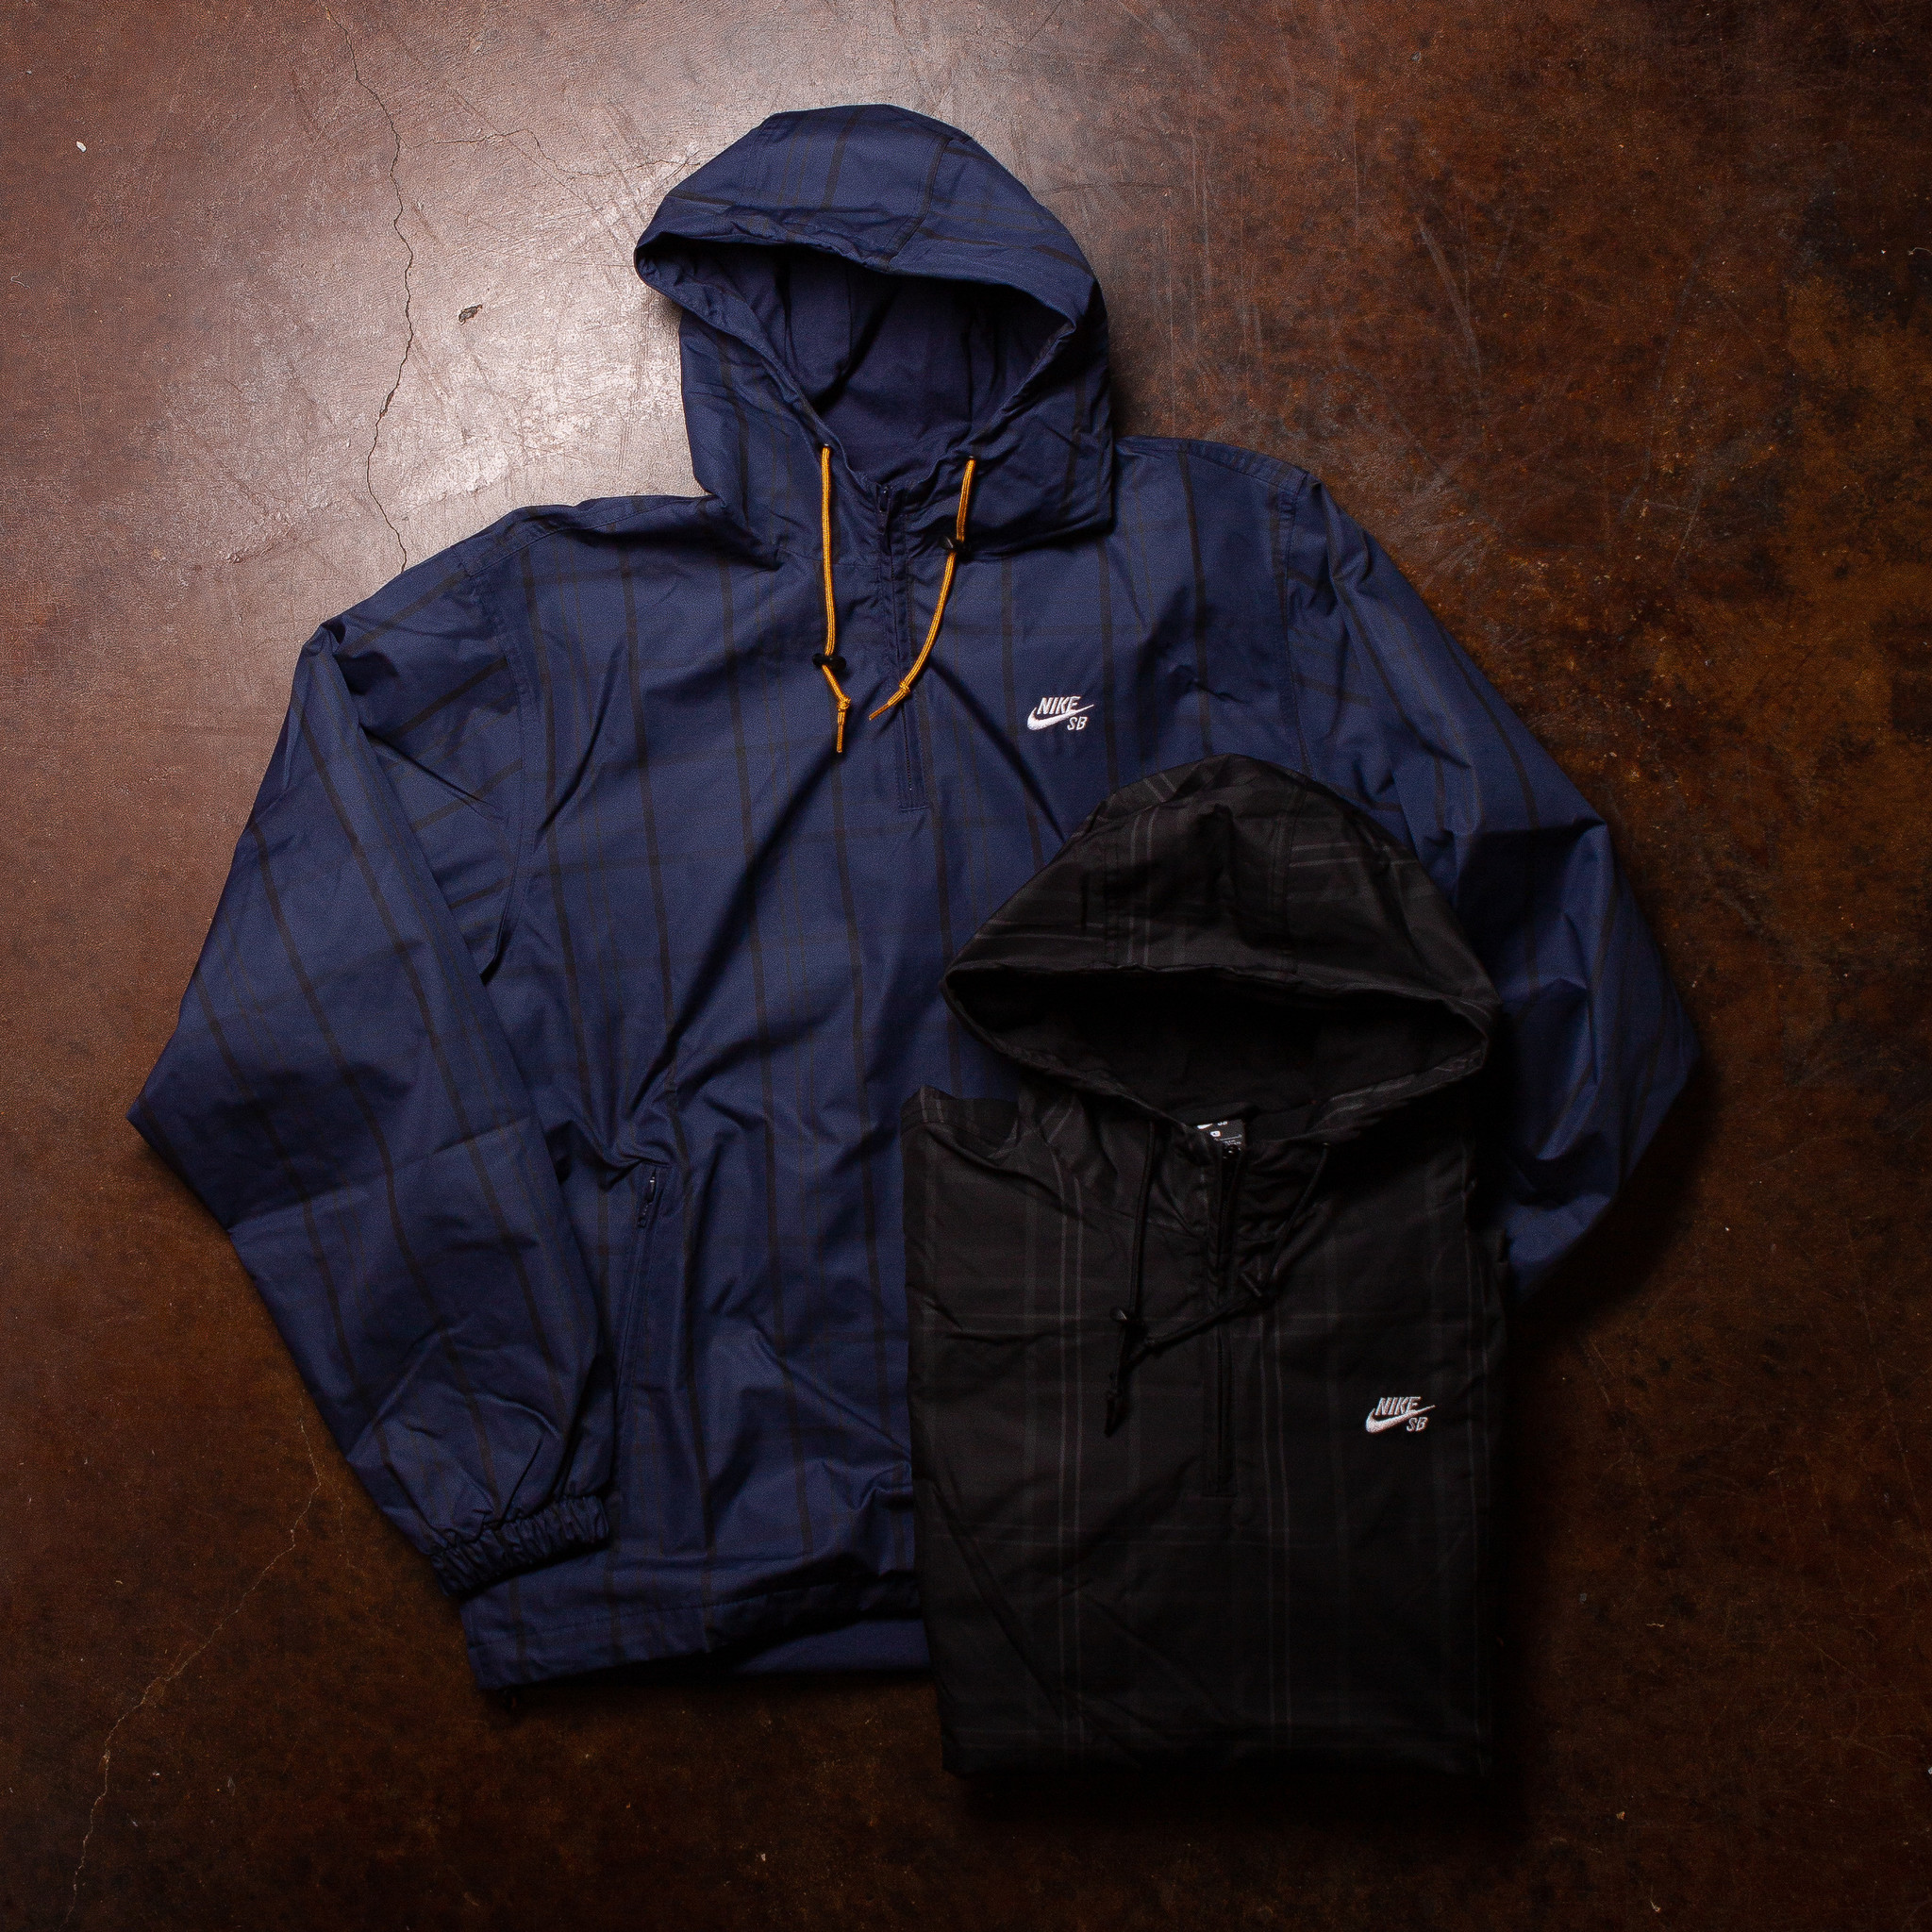 Nike SB Nike SB Plaid Nylon Anorak Jacket